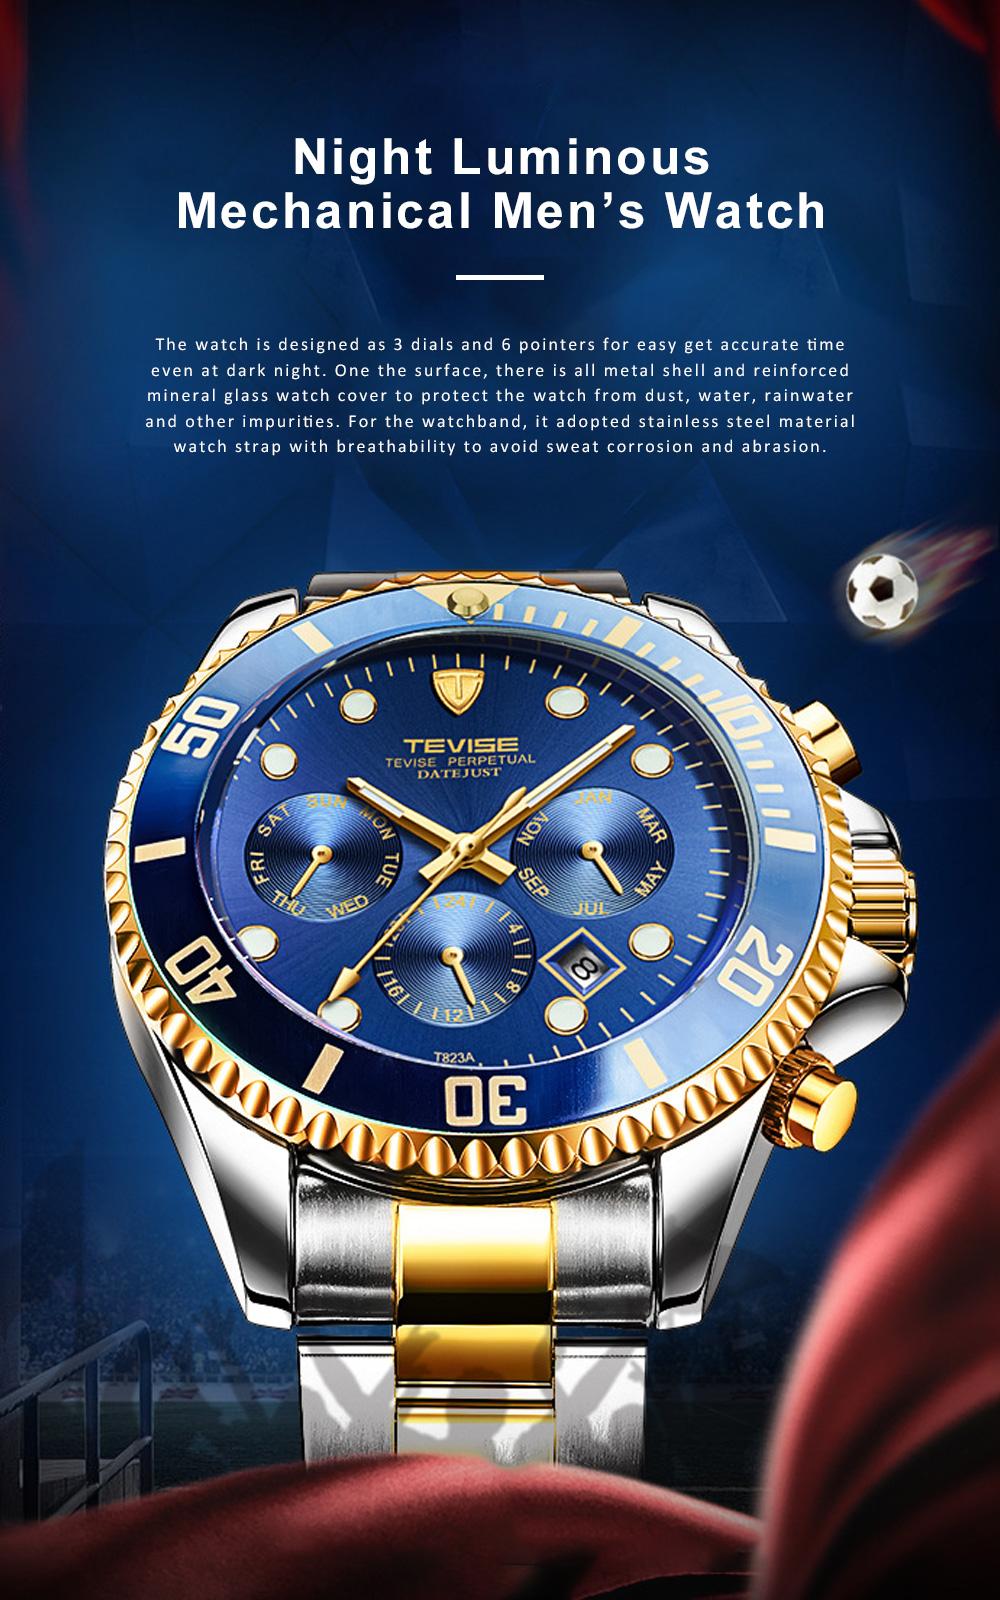 Night Luminous Mechanical Men's Watch Multifunctional Waterproof Wrist Watch for Businessman 0